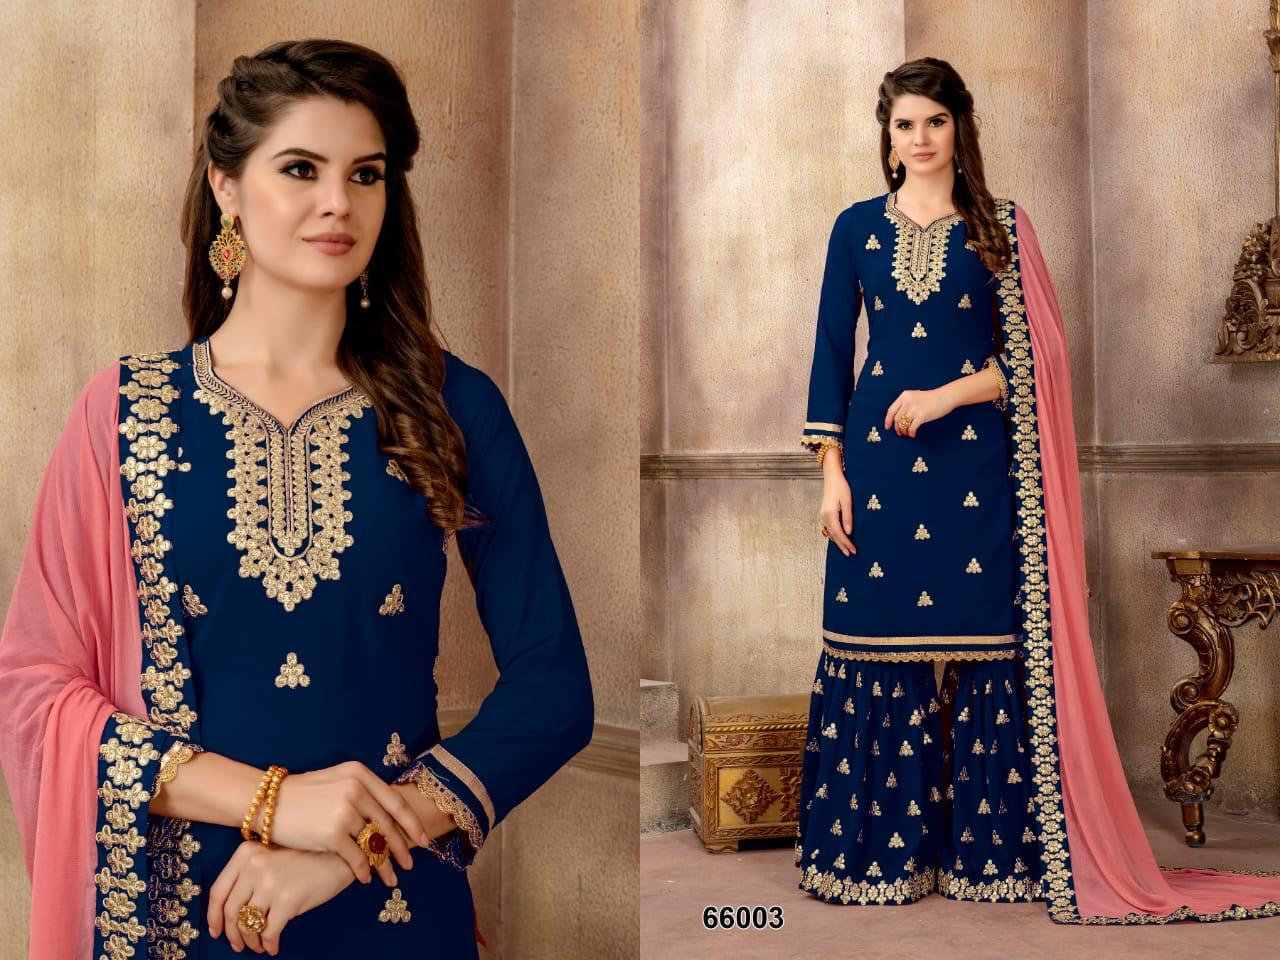 Aanaya series 66000 beautiful heavy bridal collection of Salwar kameez